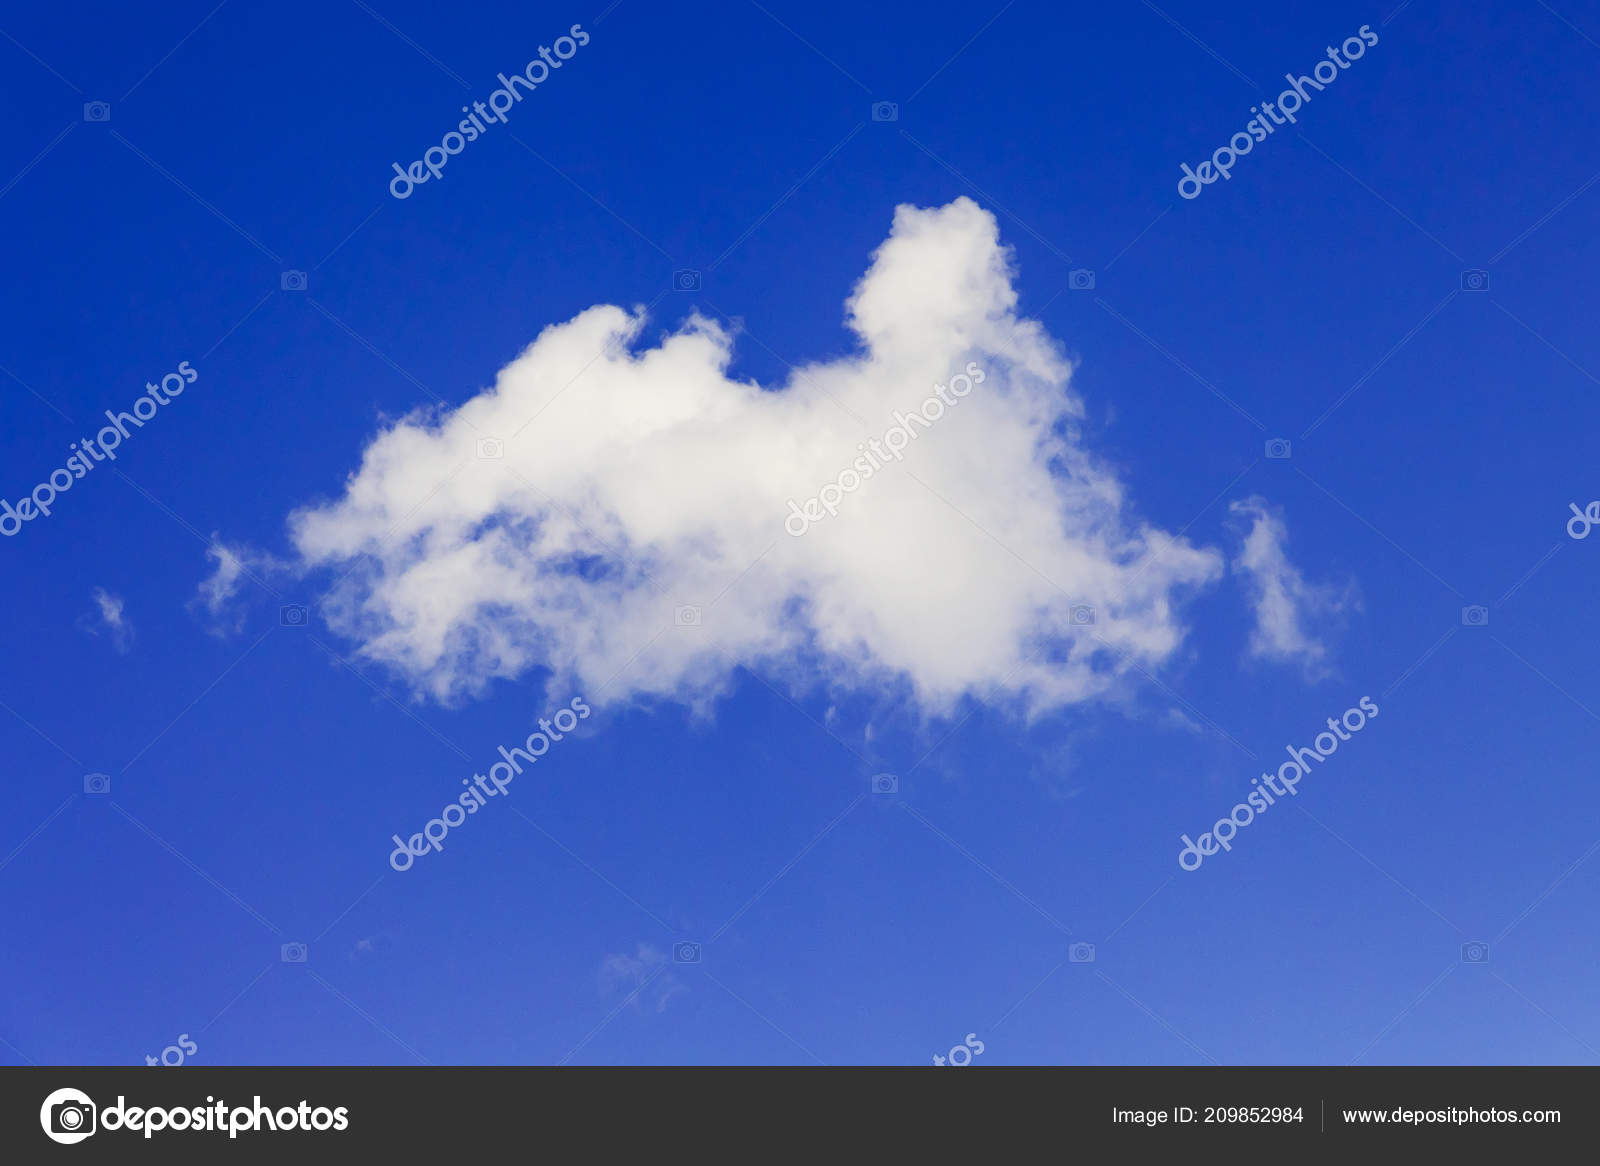 White Fluffy Cloud Blue Sky Bright Sunny Day Template Design Stock Photo C Mvolodymyr 209852984